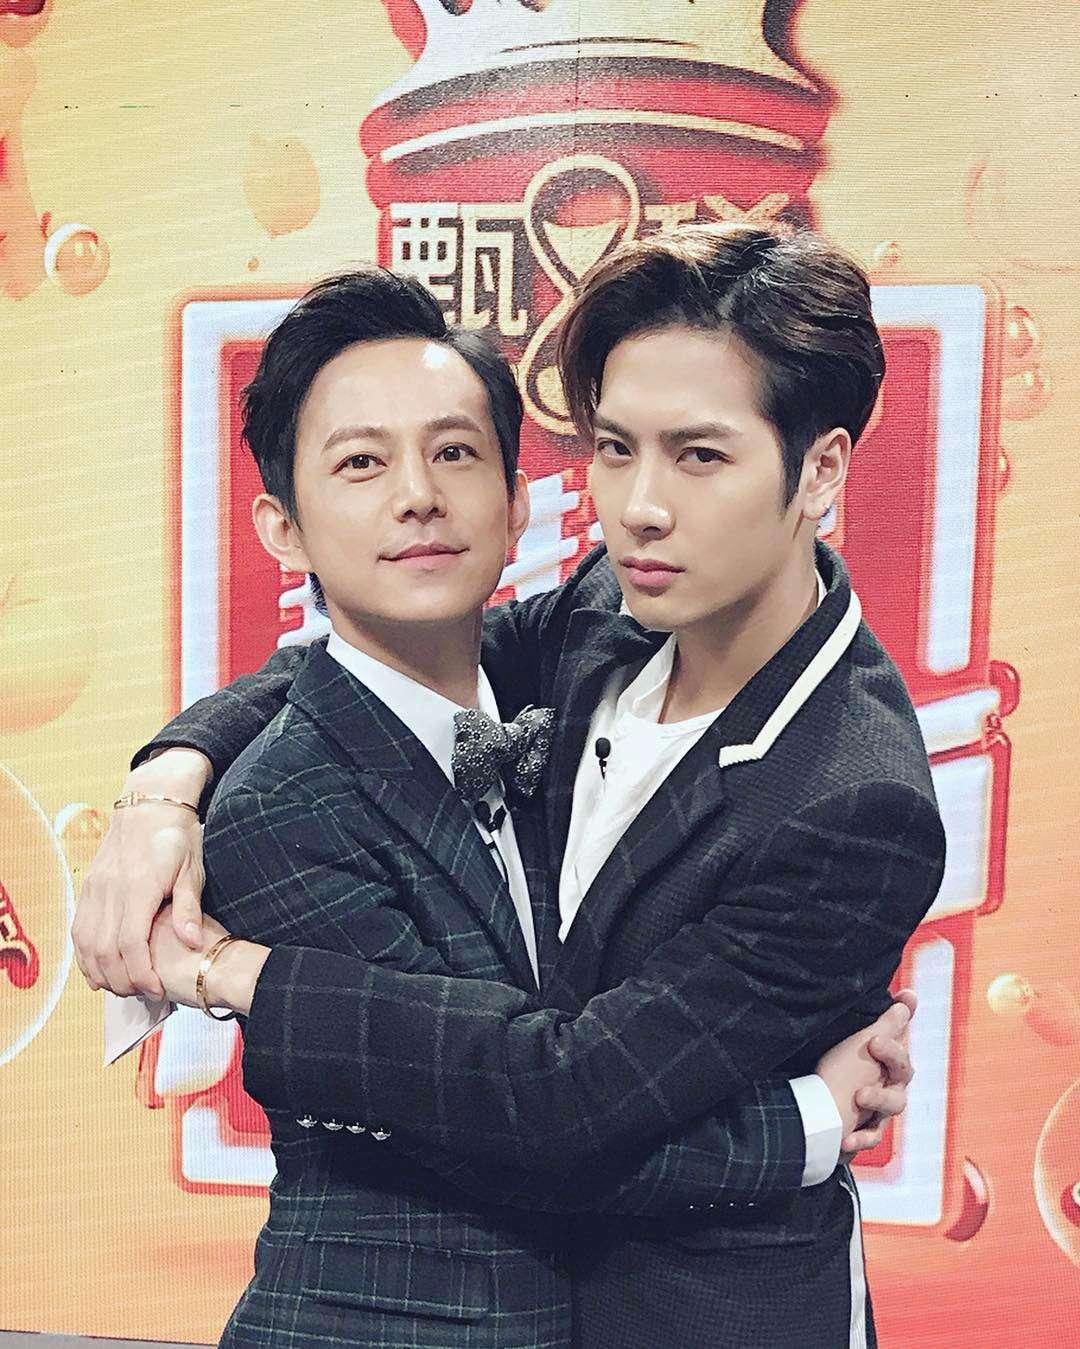 JYP也為了他設立個人工作室,Jackson也以個人名意在中國演藝圈非常活躍,讓韓國網友表示:「中國成員又會像SM旗下的一樣了...」,「GOT7怎麼辦?!」,「中國人只想來這(韓國)過水 在回去大撈一筆」